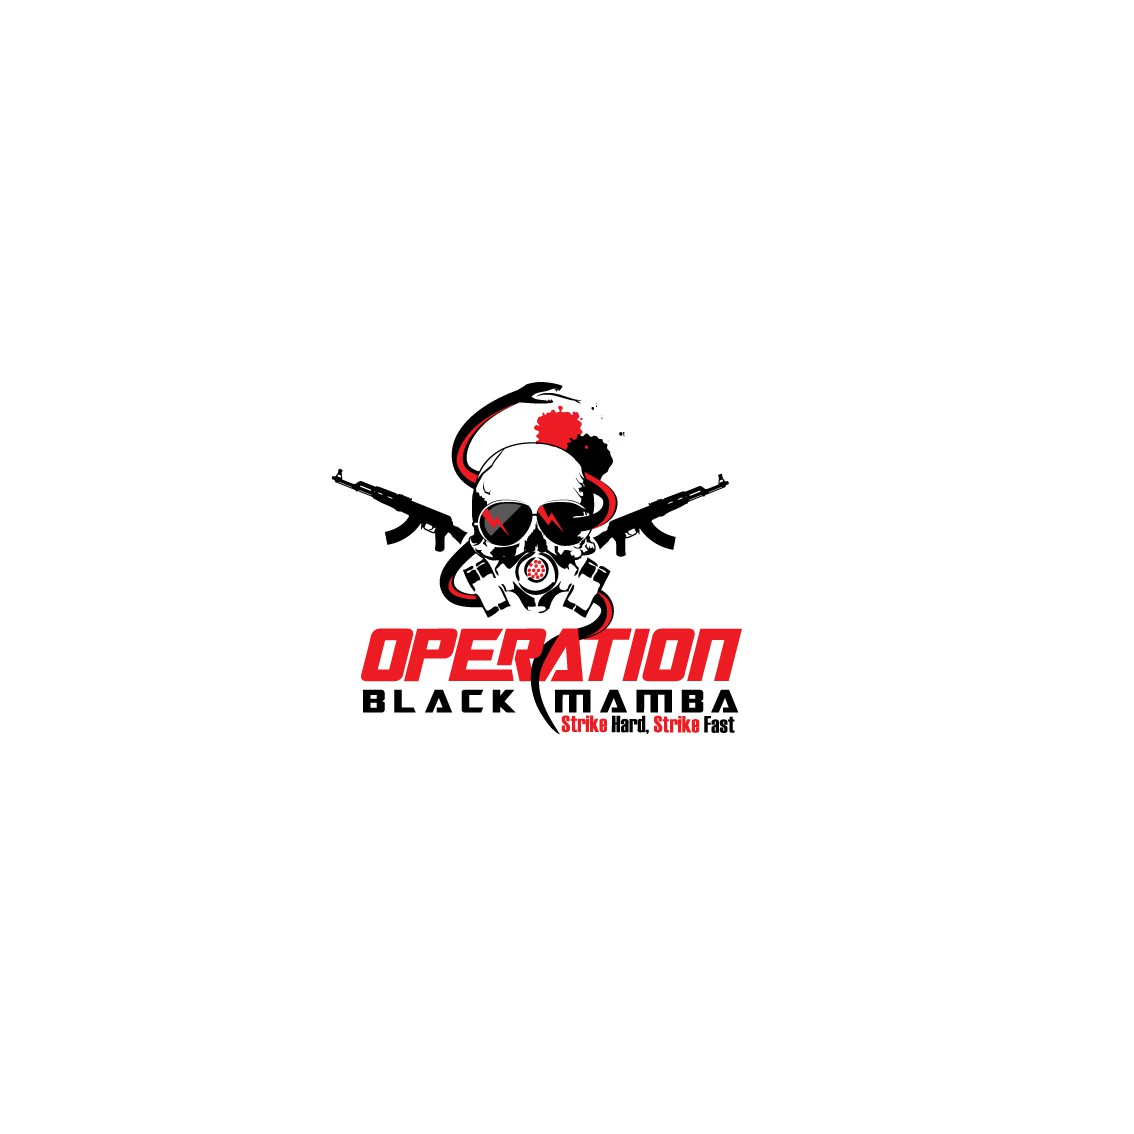 Awesome Logo Needed for OperationBlackMamba.com